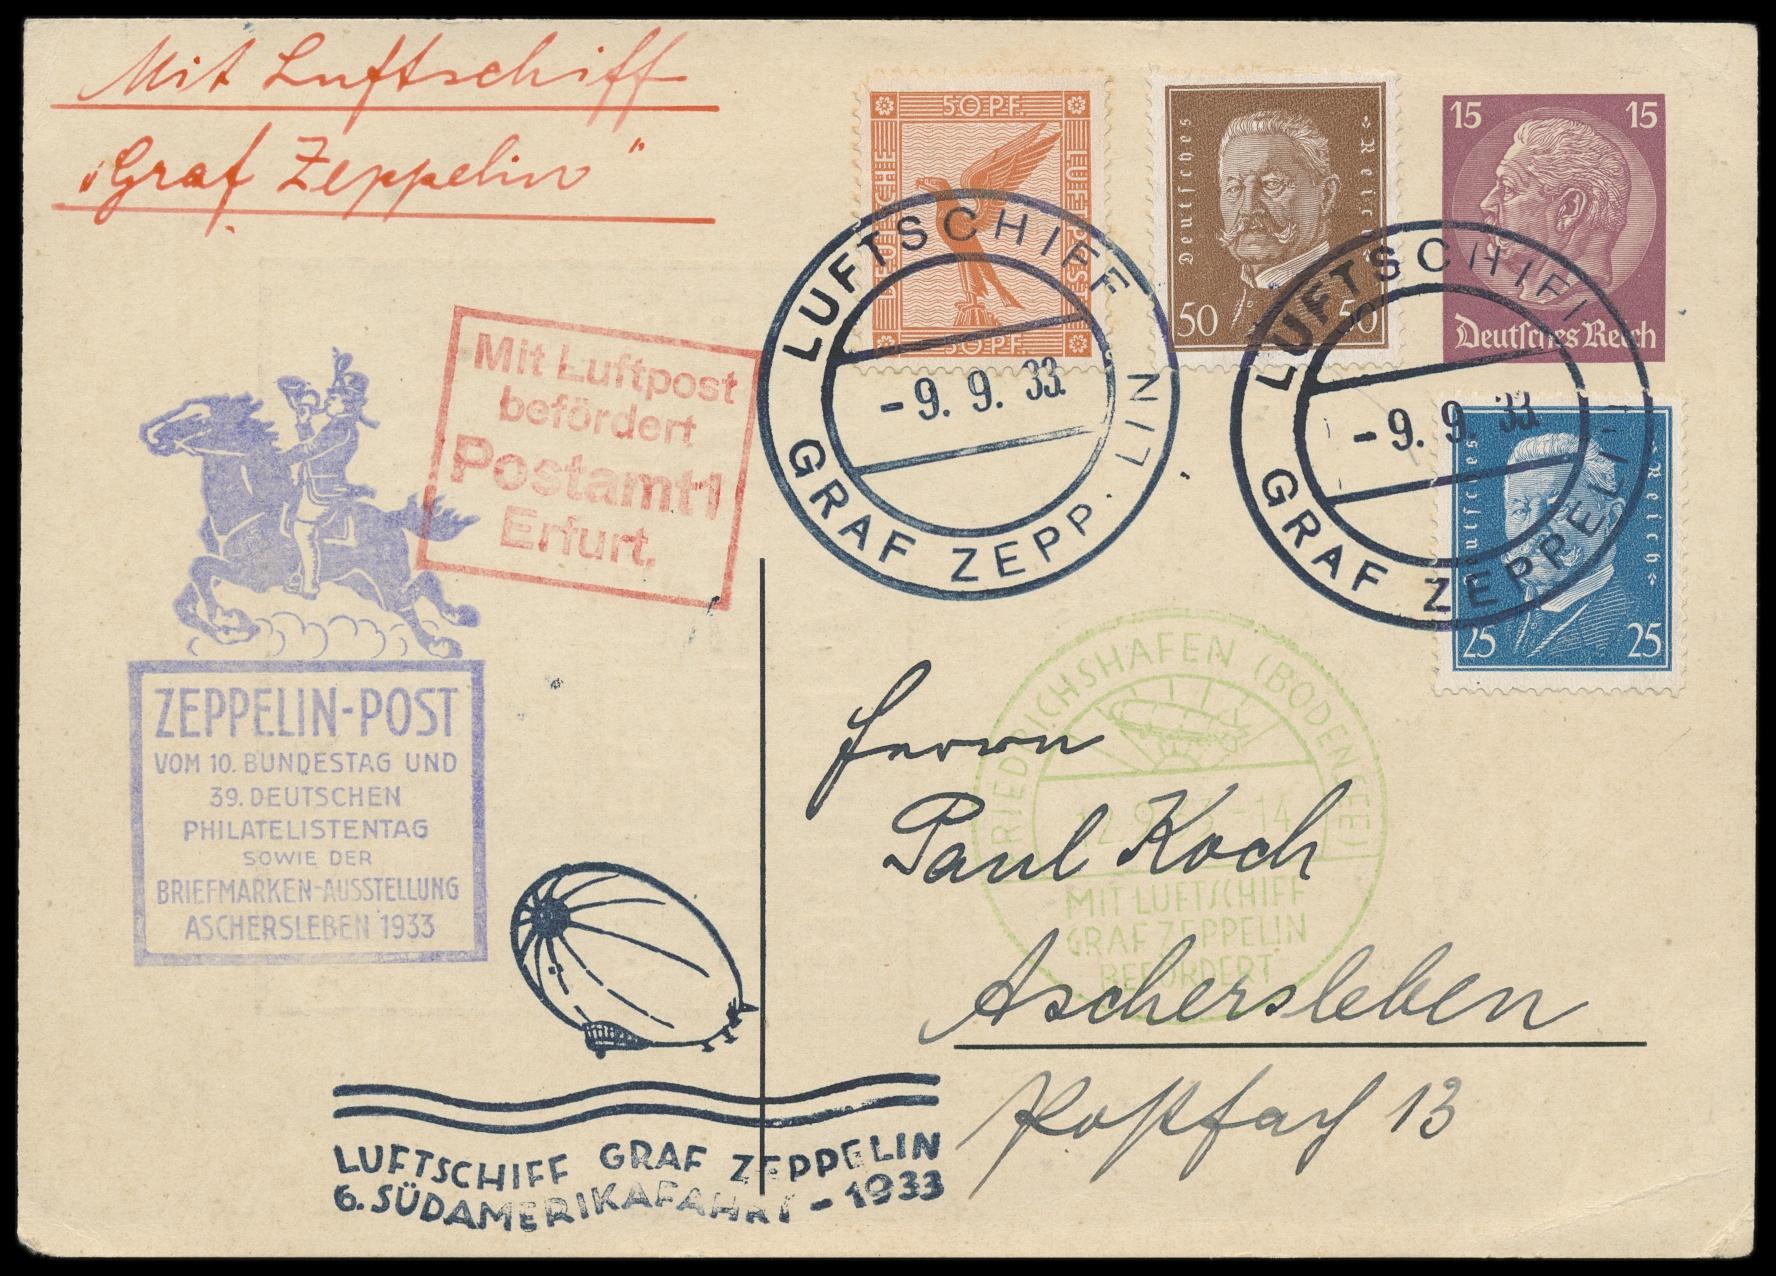 Lot 1888 - Flug- und Zeppelinpost zeppelinpost -  Peter Harlos Auctions 42. Harlos Auktion